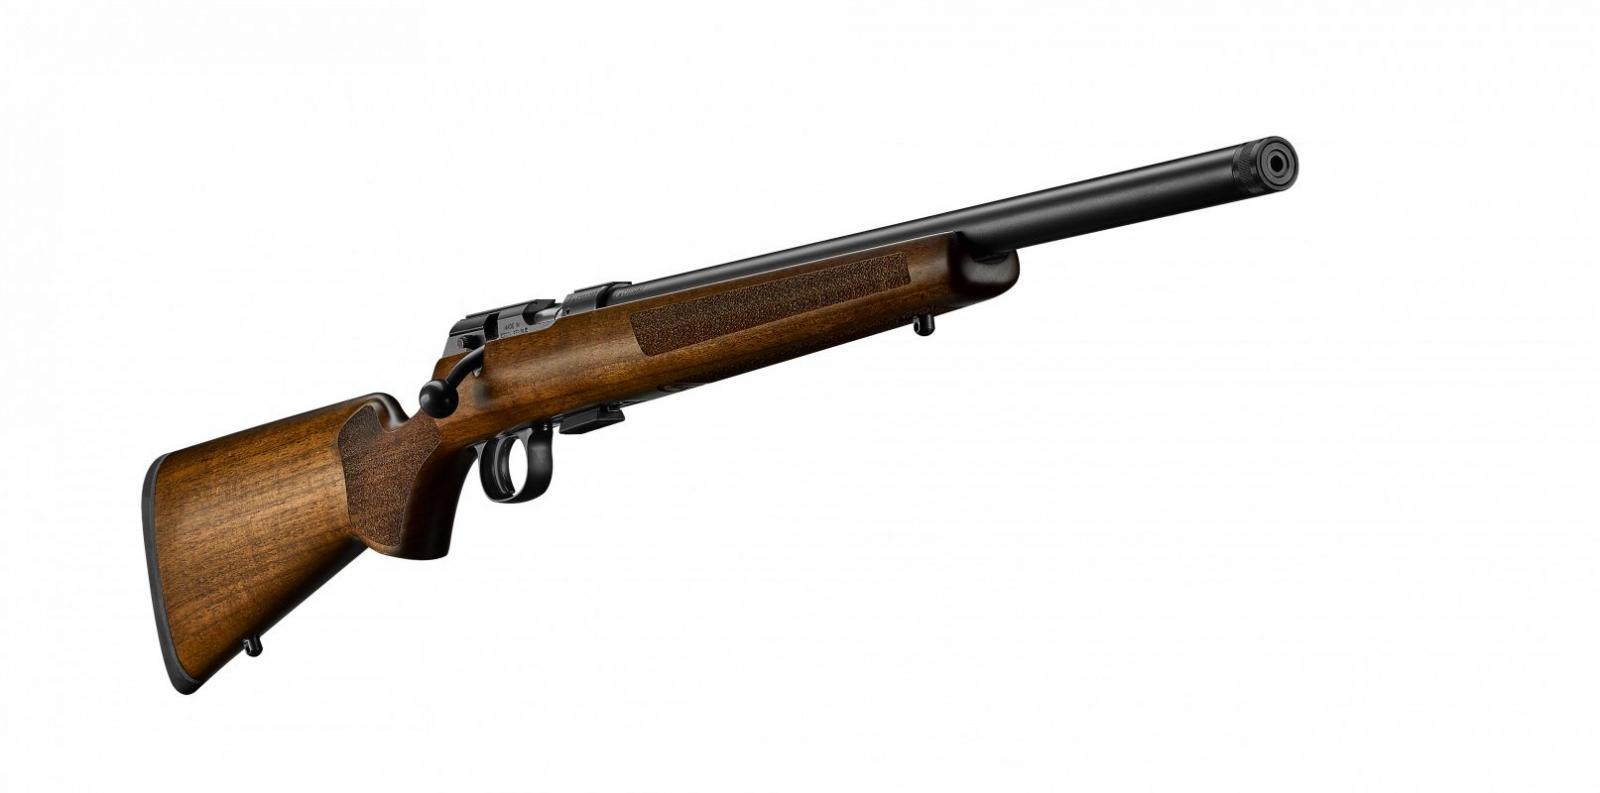 Carabine CZ 457 Varmint cal 17 HMR